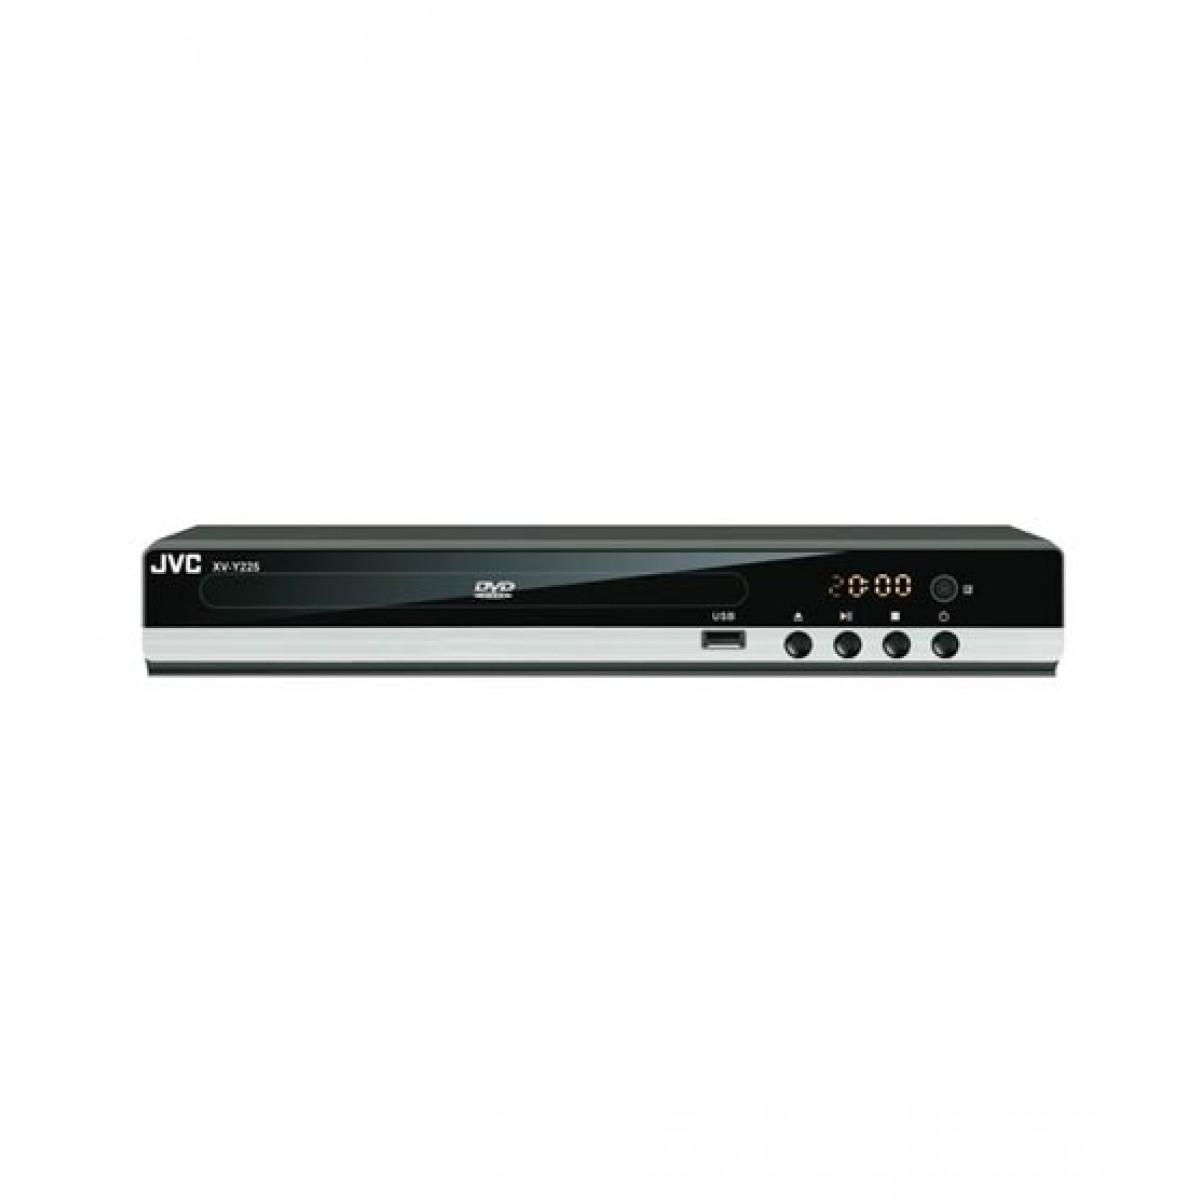 JVC Multi-System DVD Player (XV-Y225)